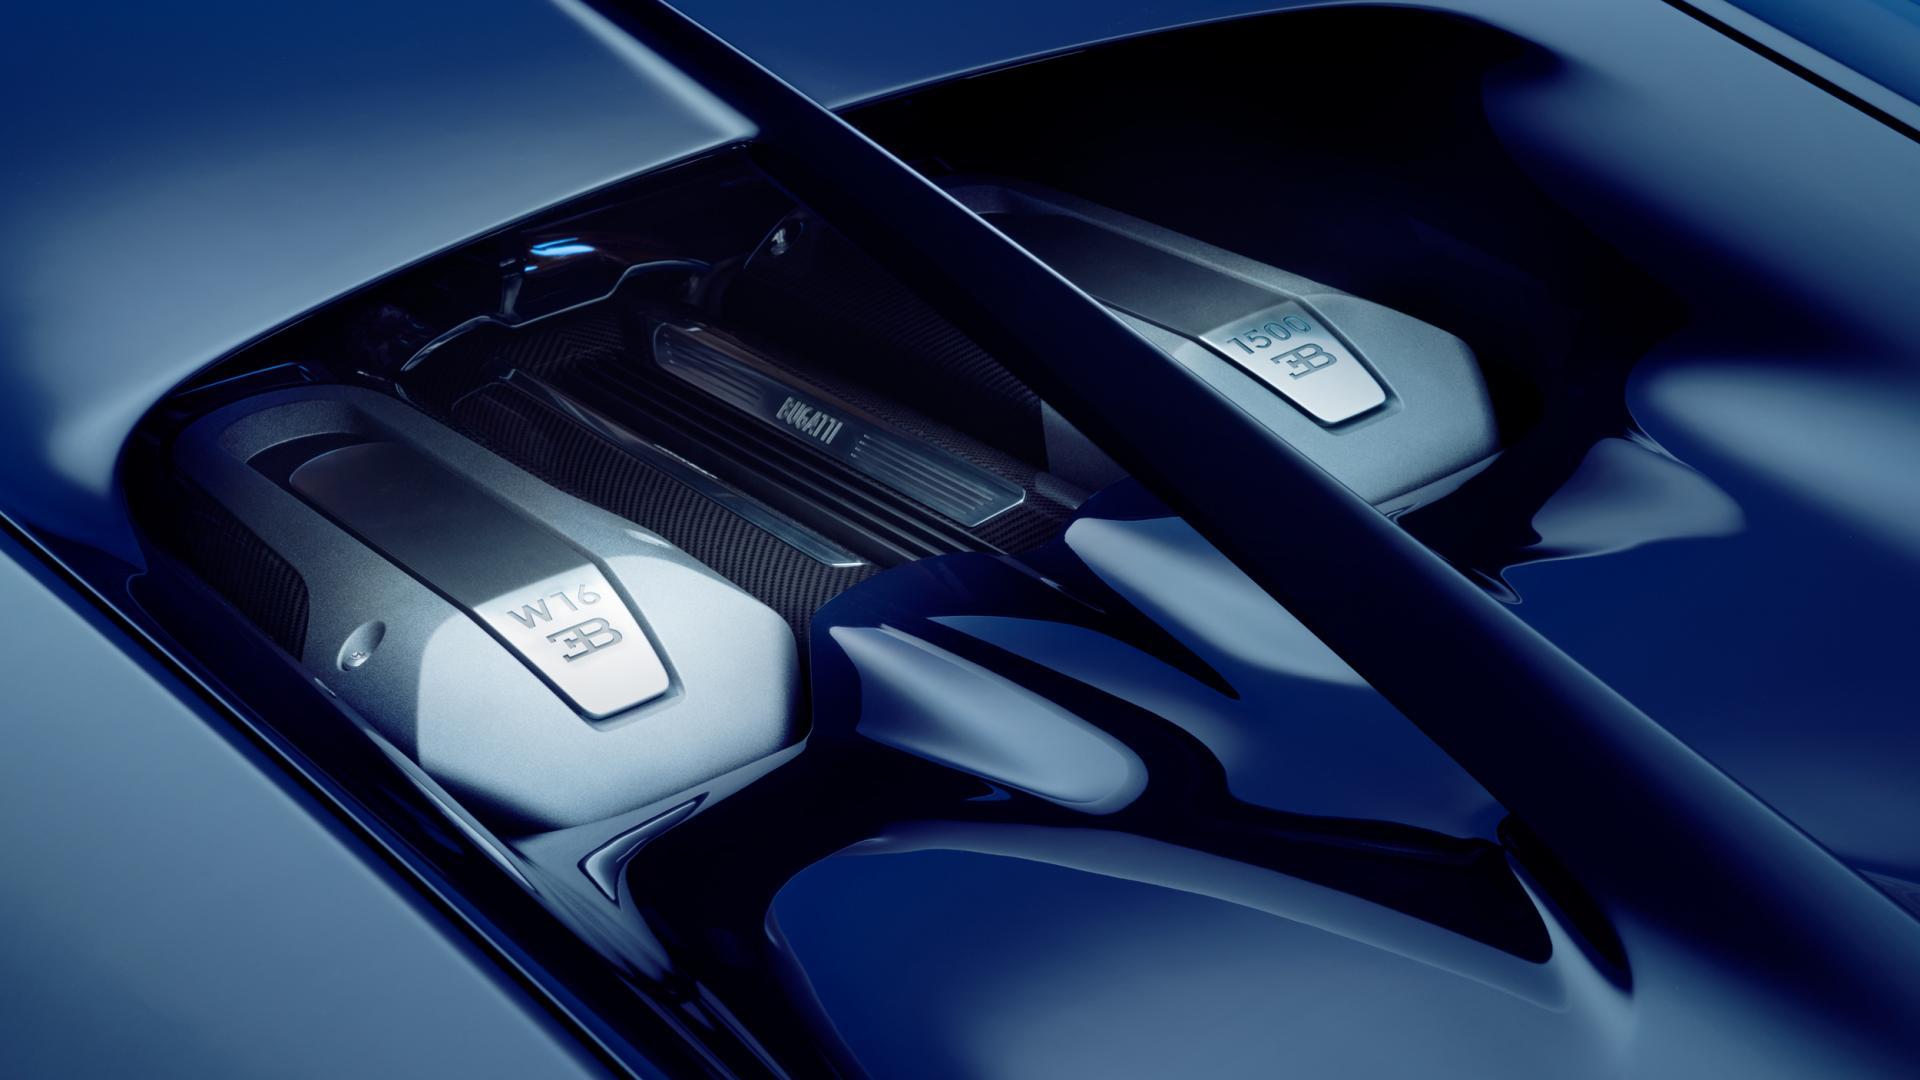 bugatti-chiron-08-1.thumb.jpg.98888fa8882318697bc5ab27ddd27c4a.jpg